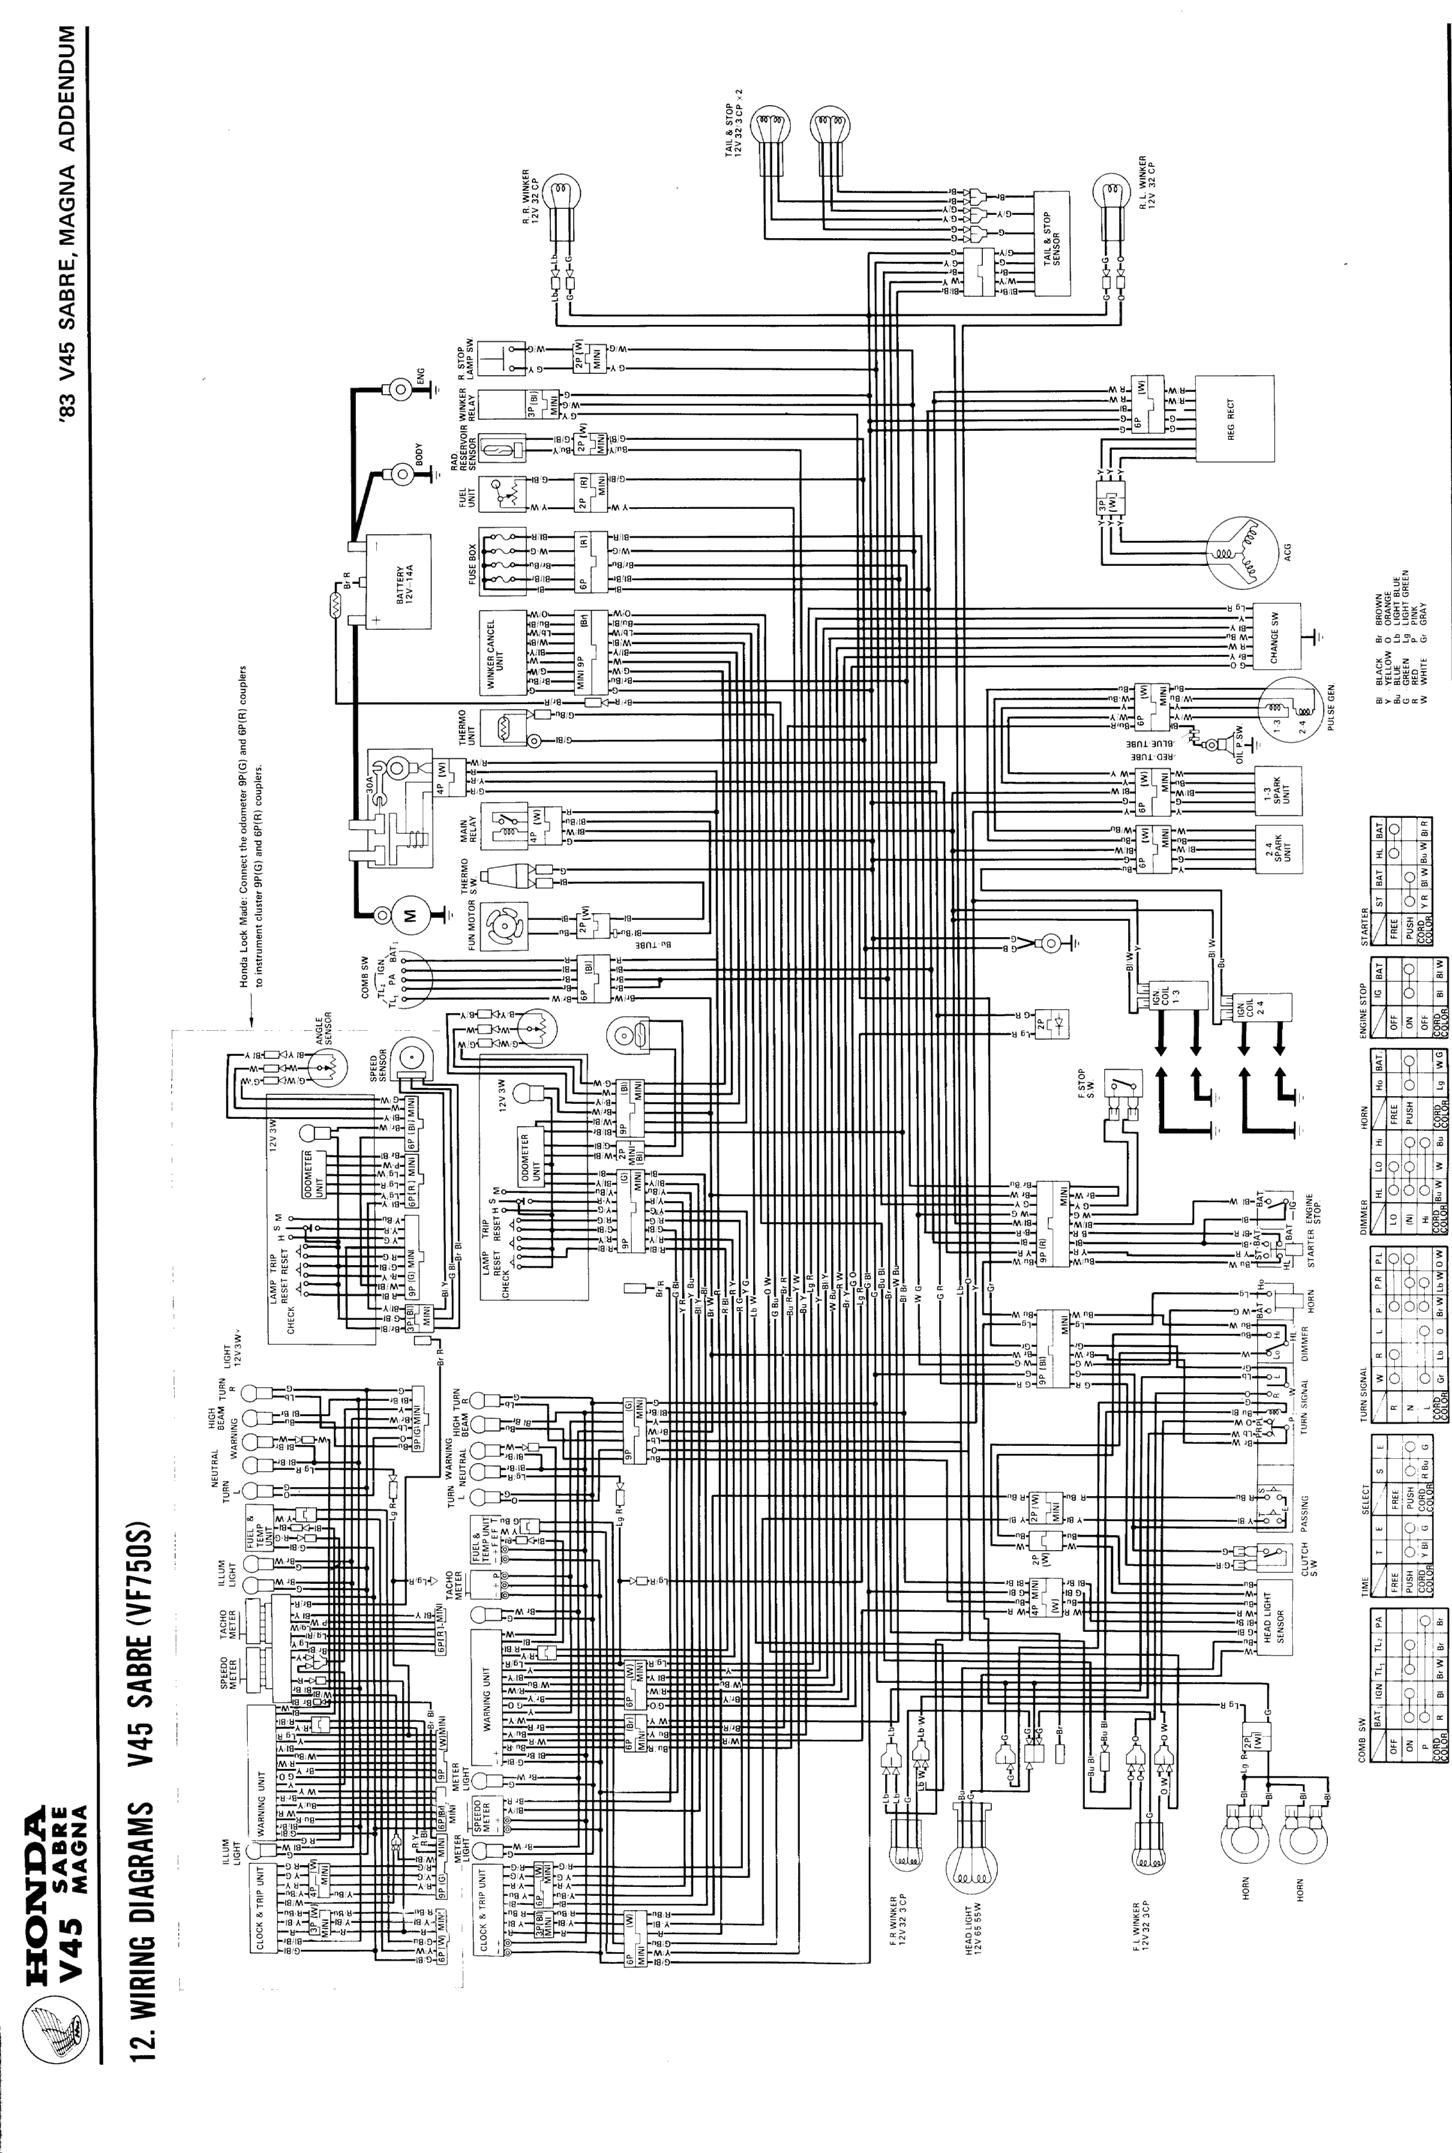 hight resolution of honda sabre wiring diagram wiring diagram and schematics honda v65 sabre wiring diagram honda vf 750